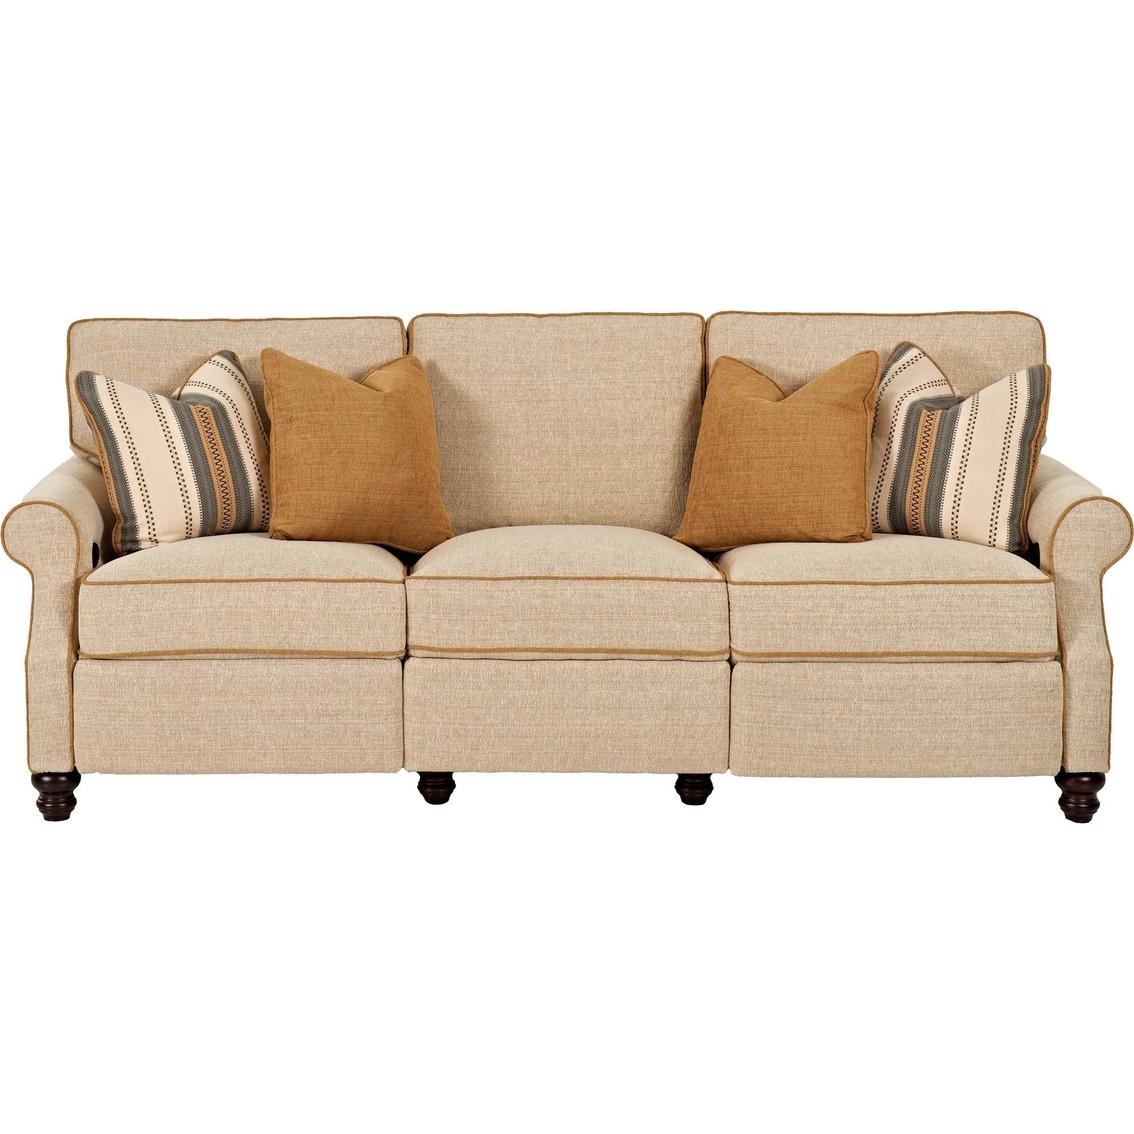 Klaussner trisha yearwood tifton reclining sofa sofas for Factory sofas